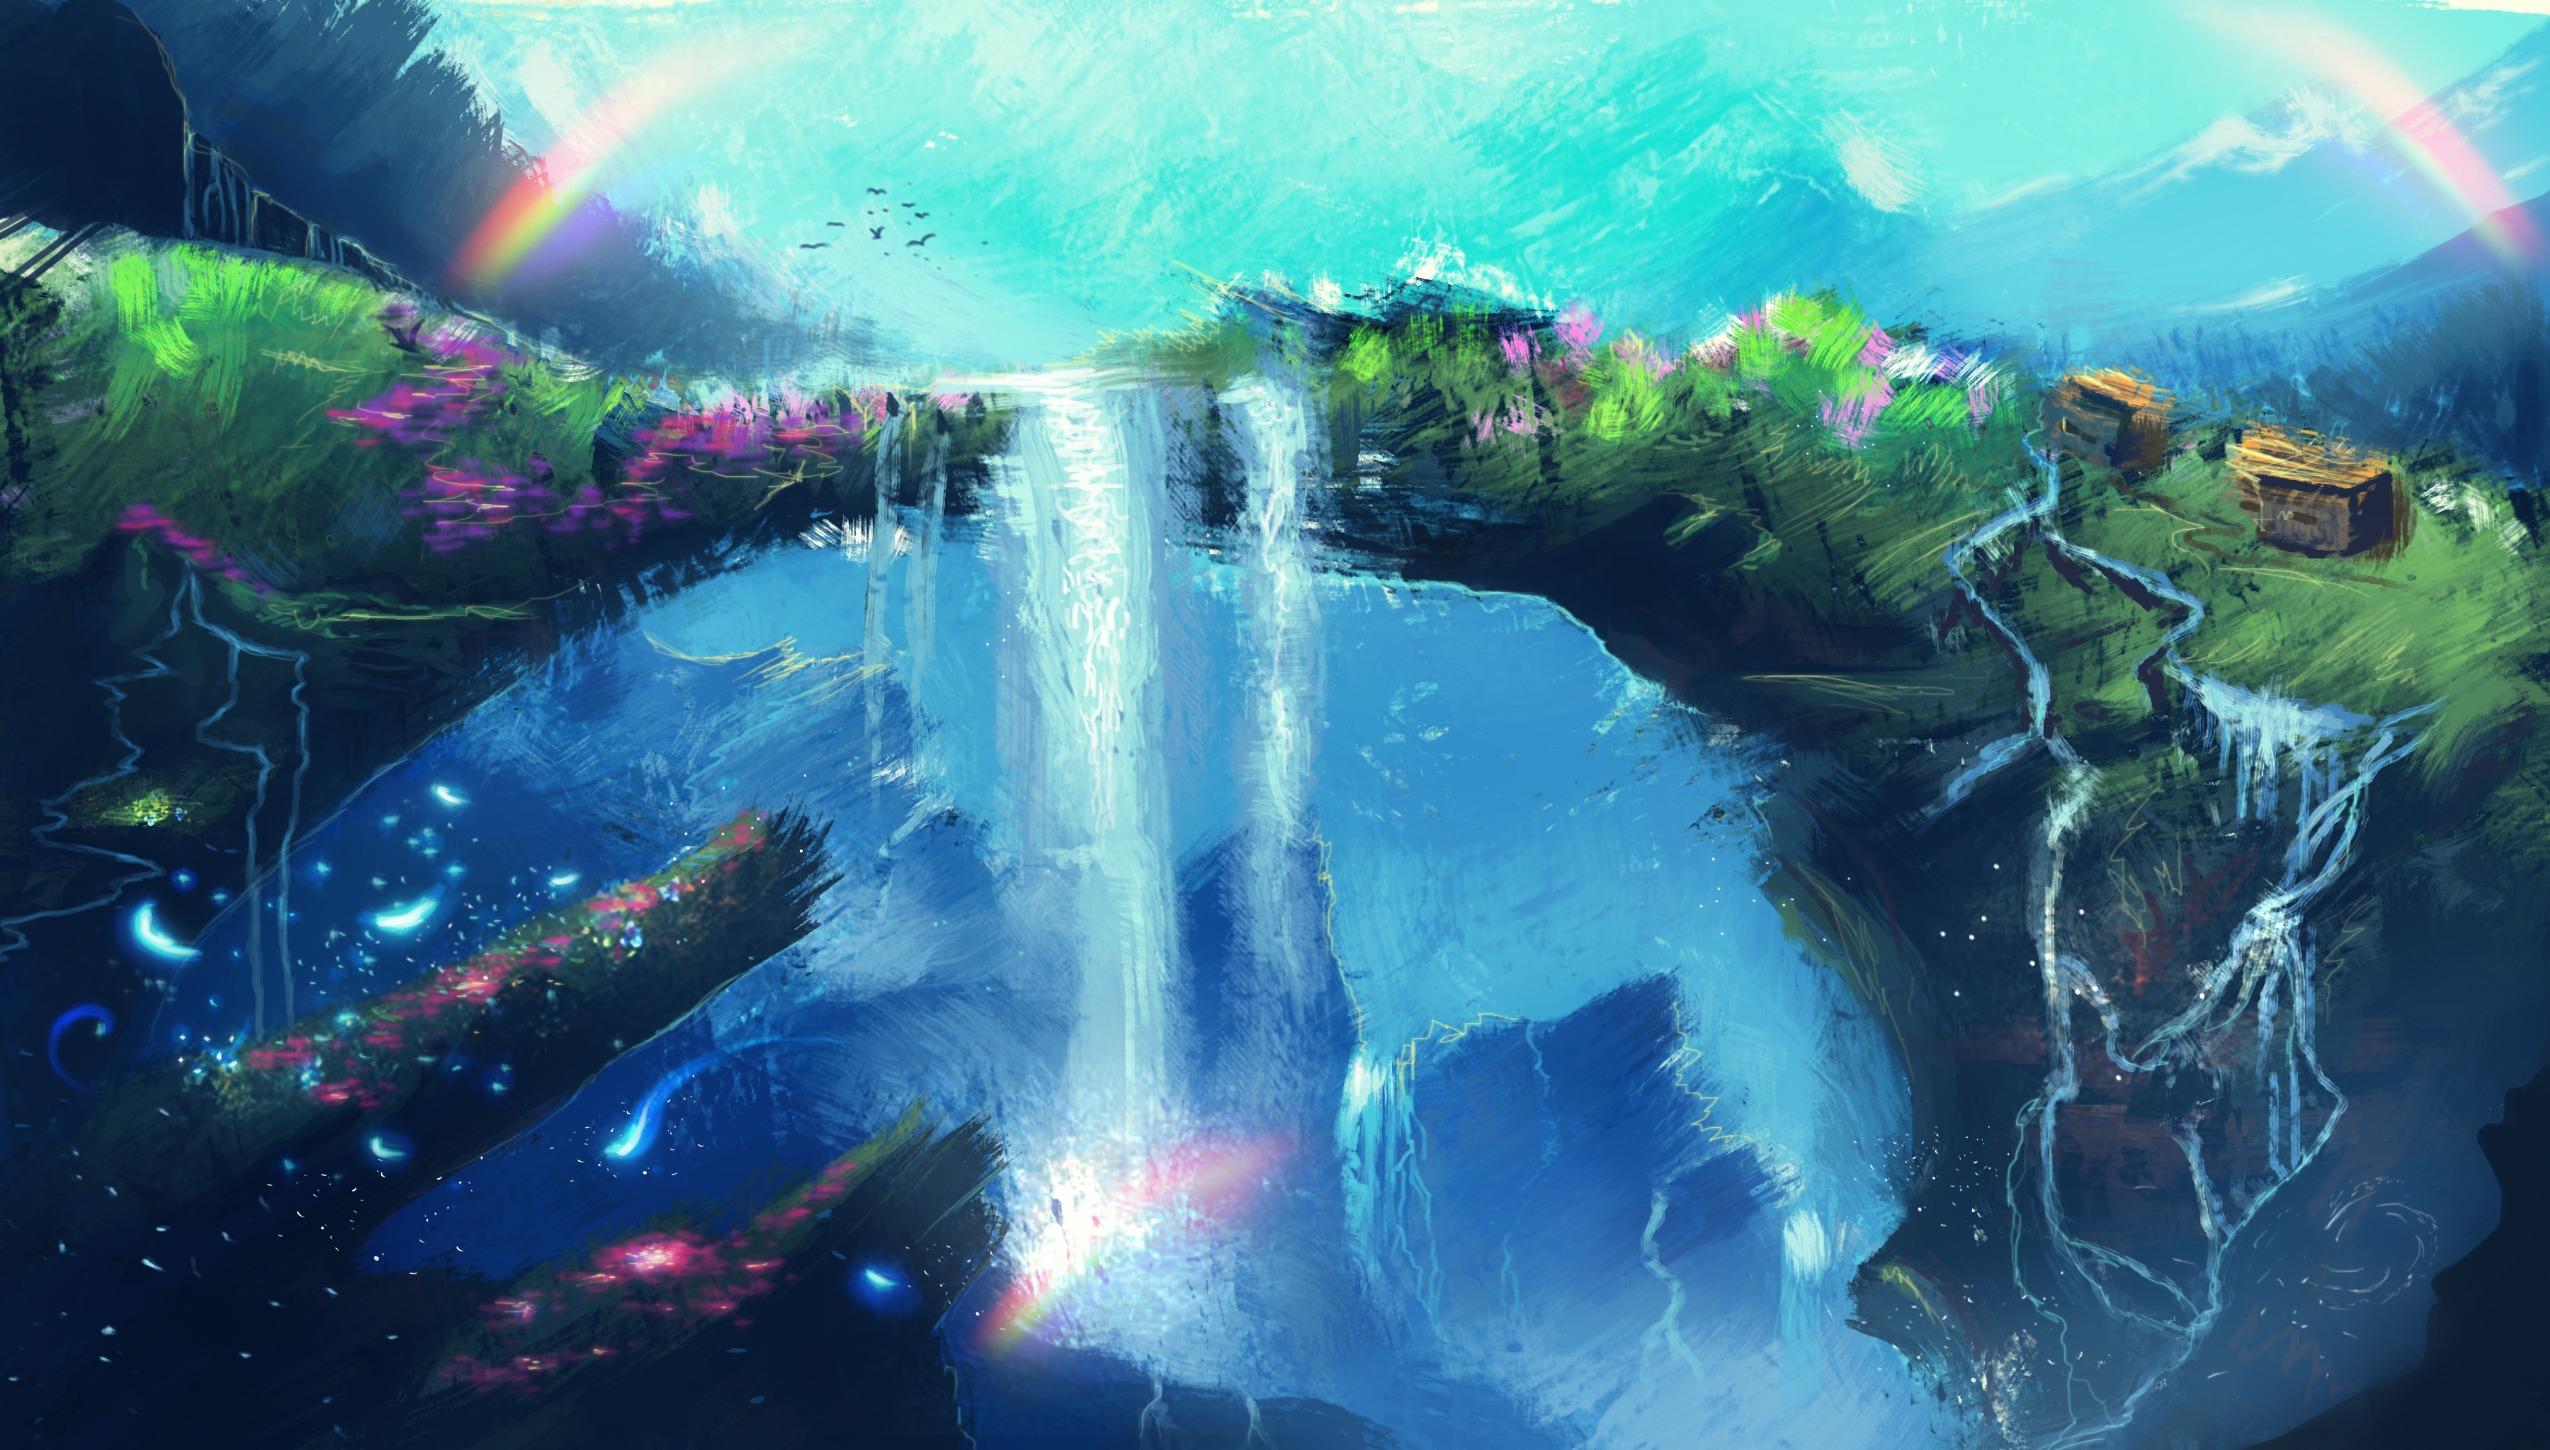 <p>Арт рисунок водопад</p>